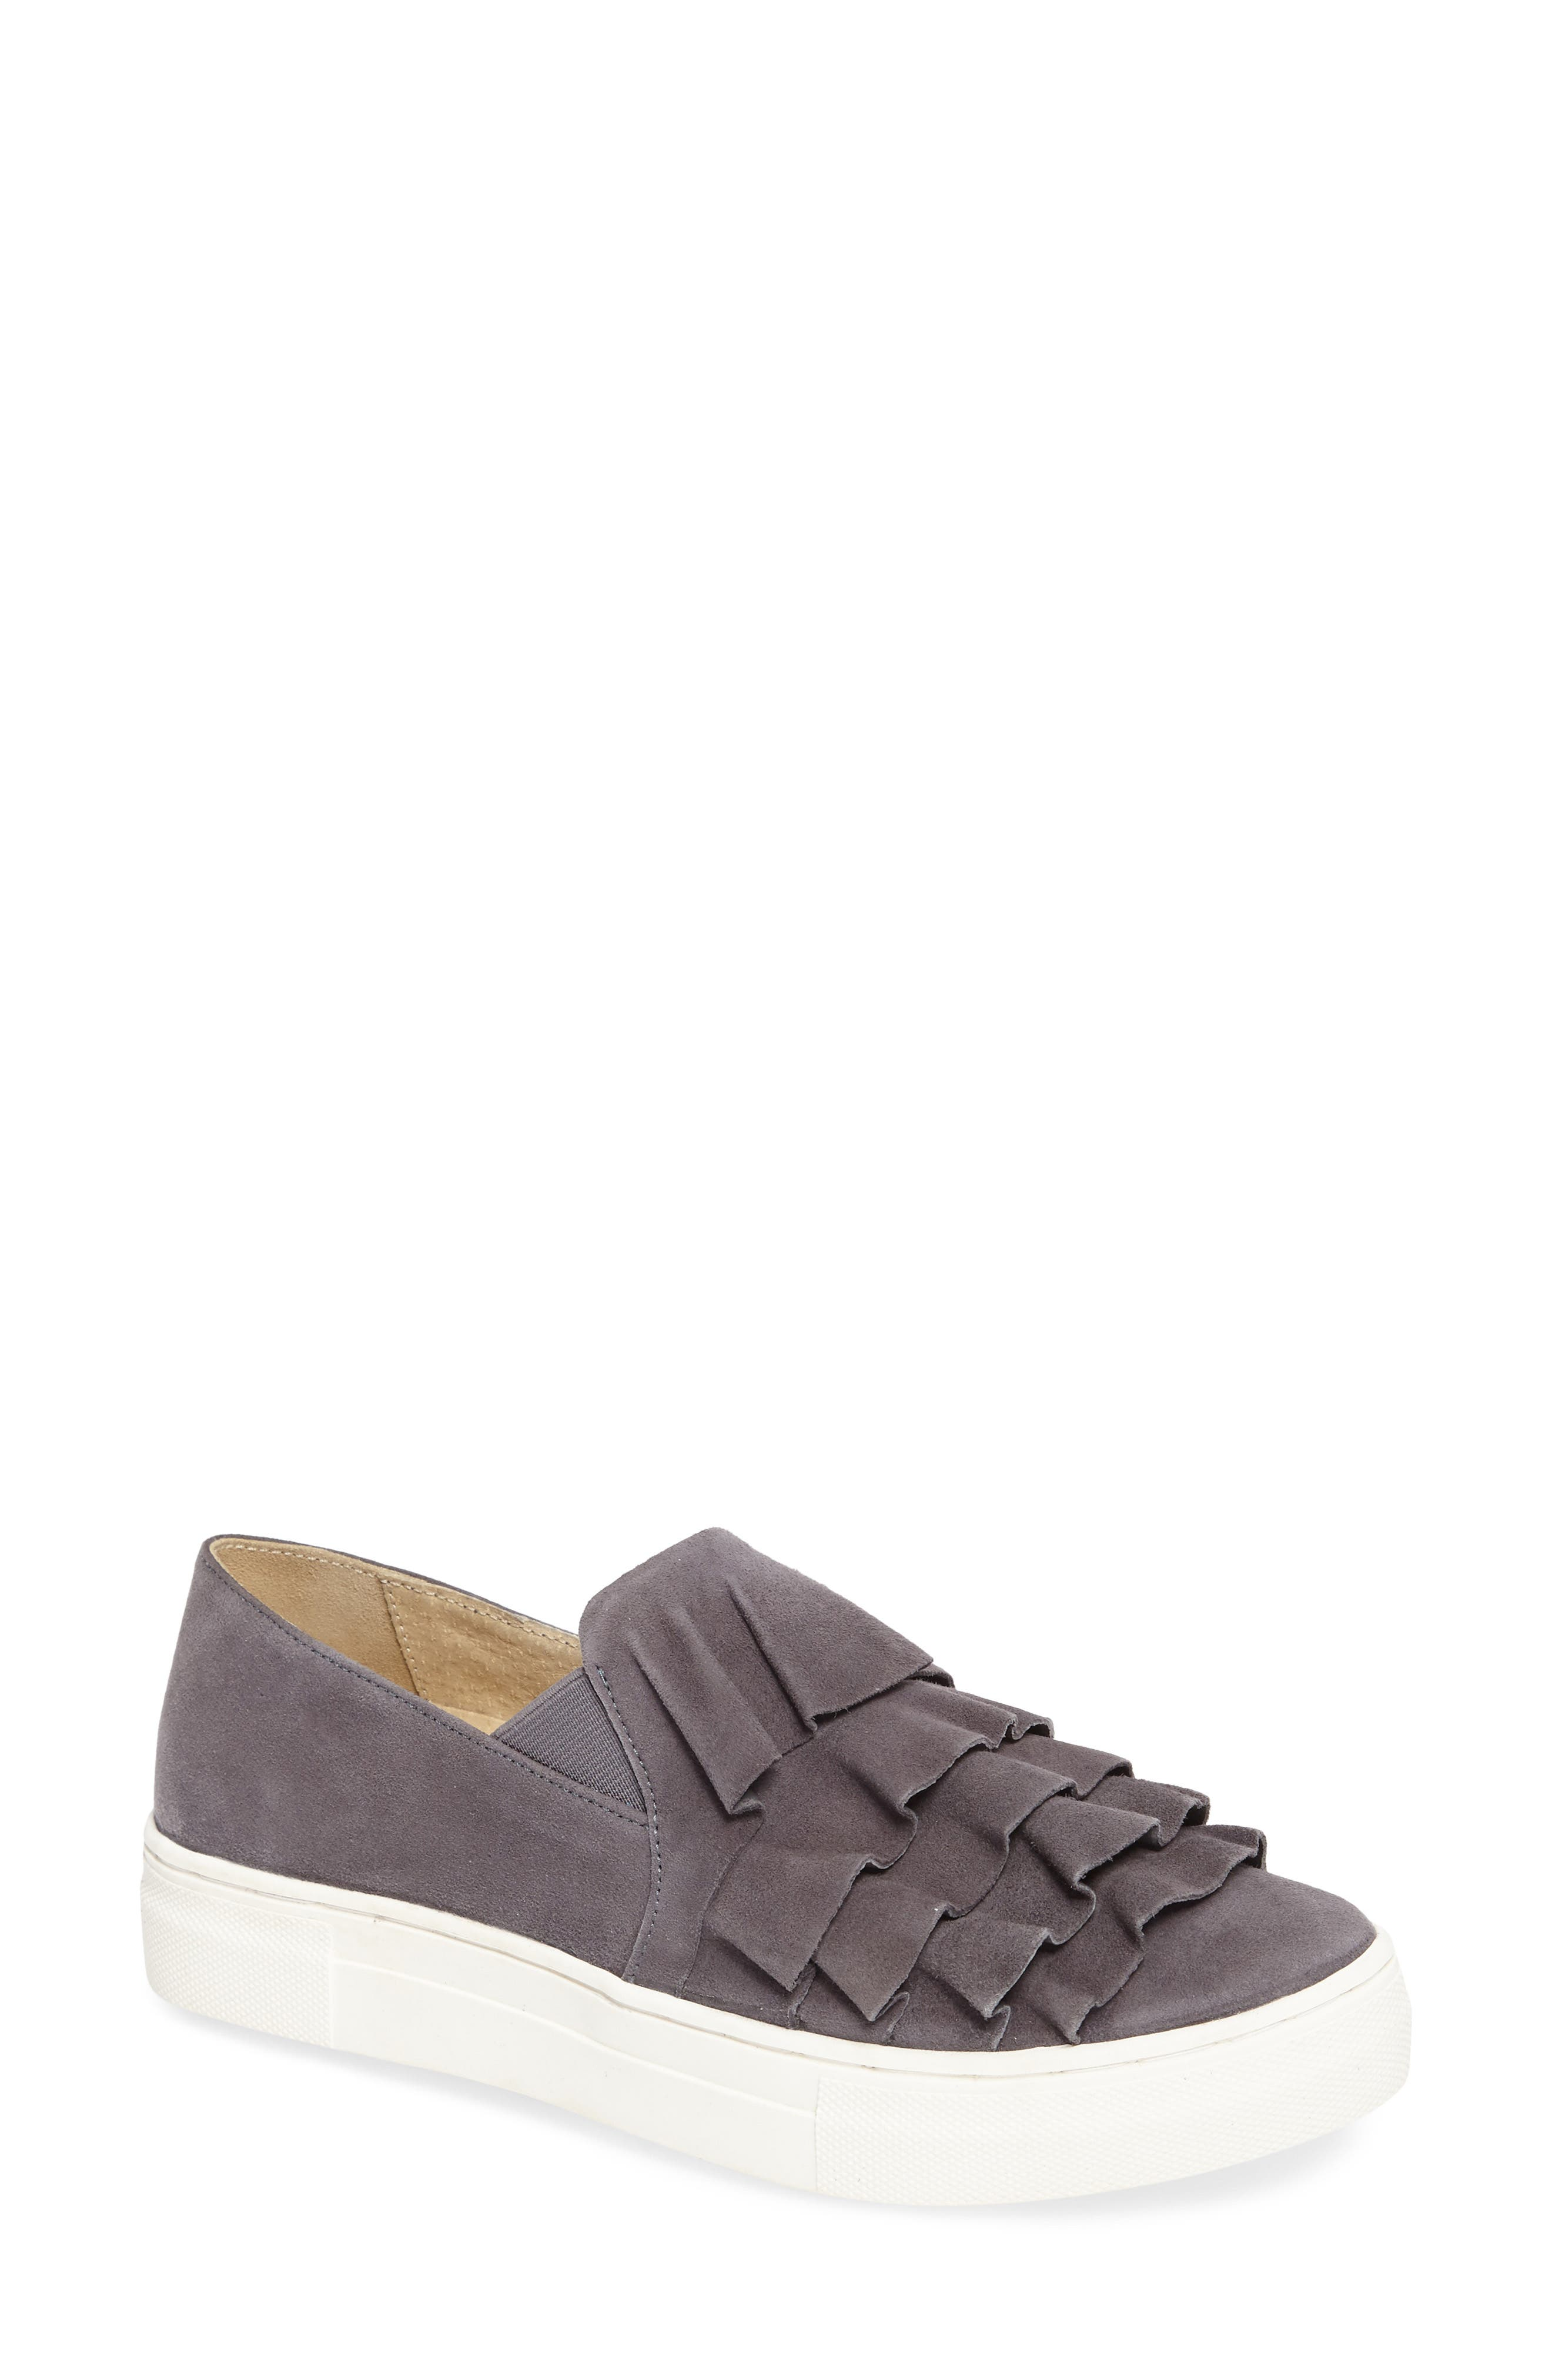 Quake Slip-On Sneaker,                         Main,                         color, 020